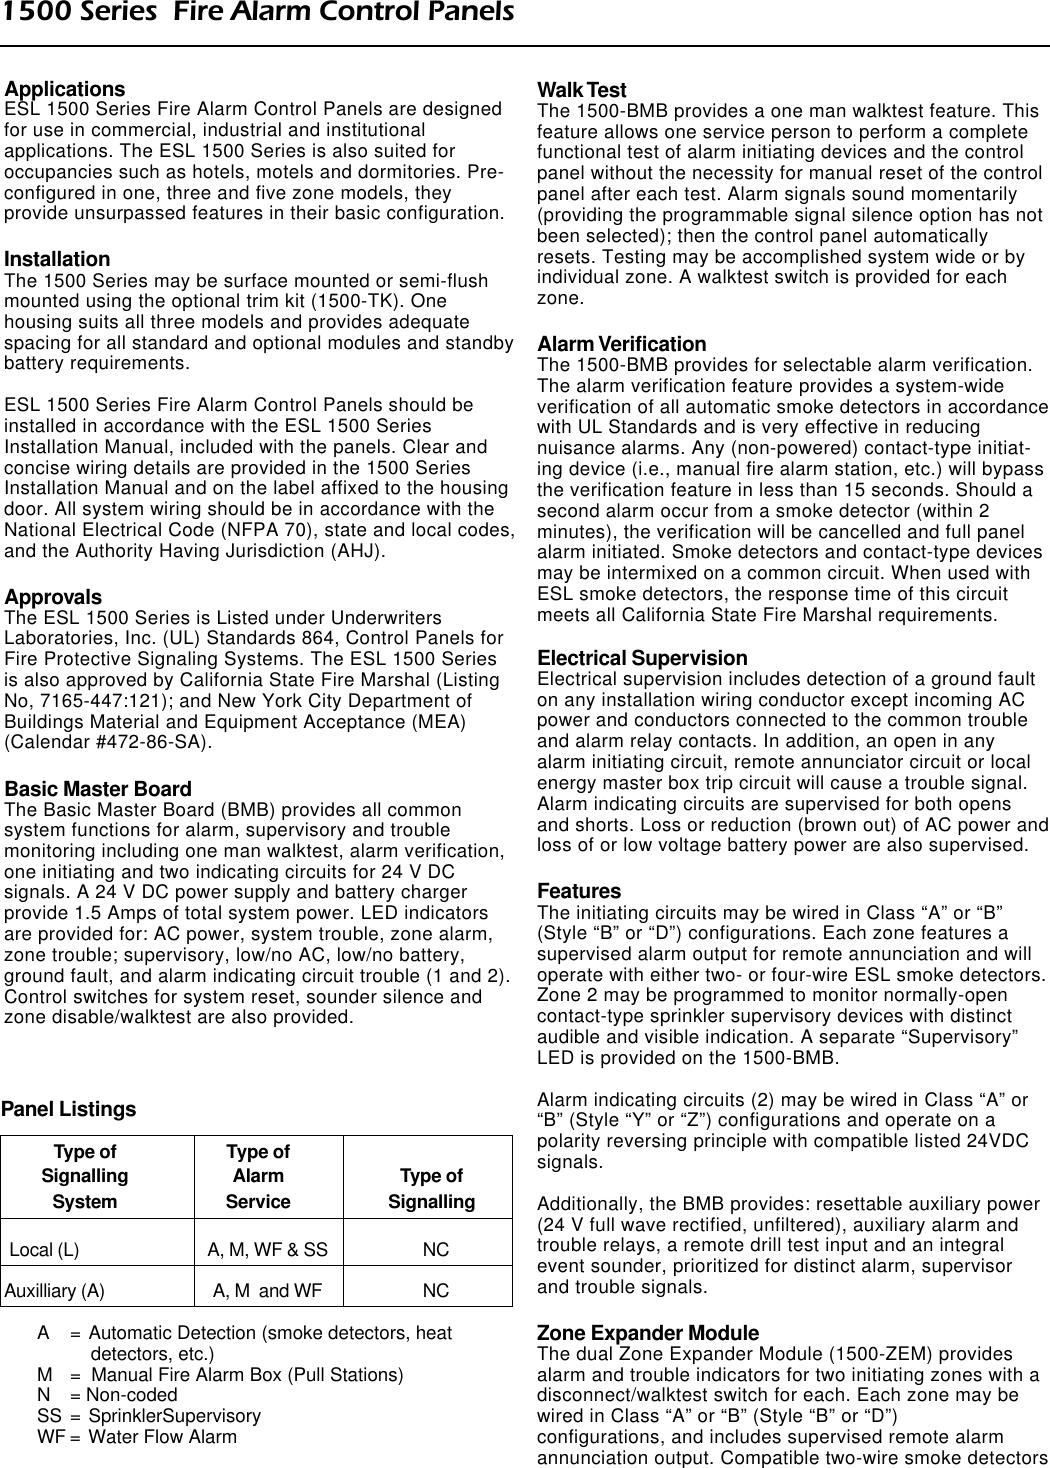 ESL 1500 Series Fire Alarm Control Panel Data Sheet 2001